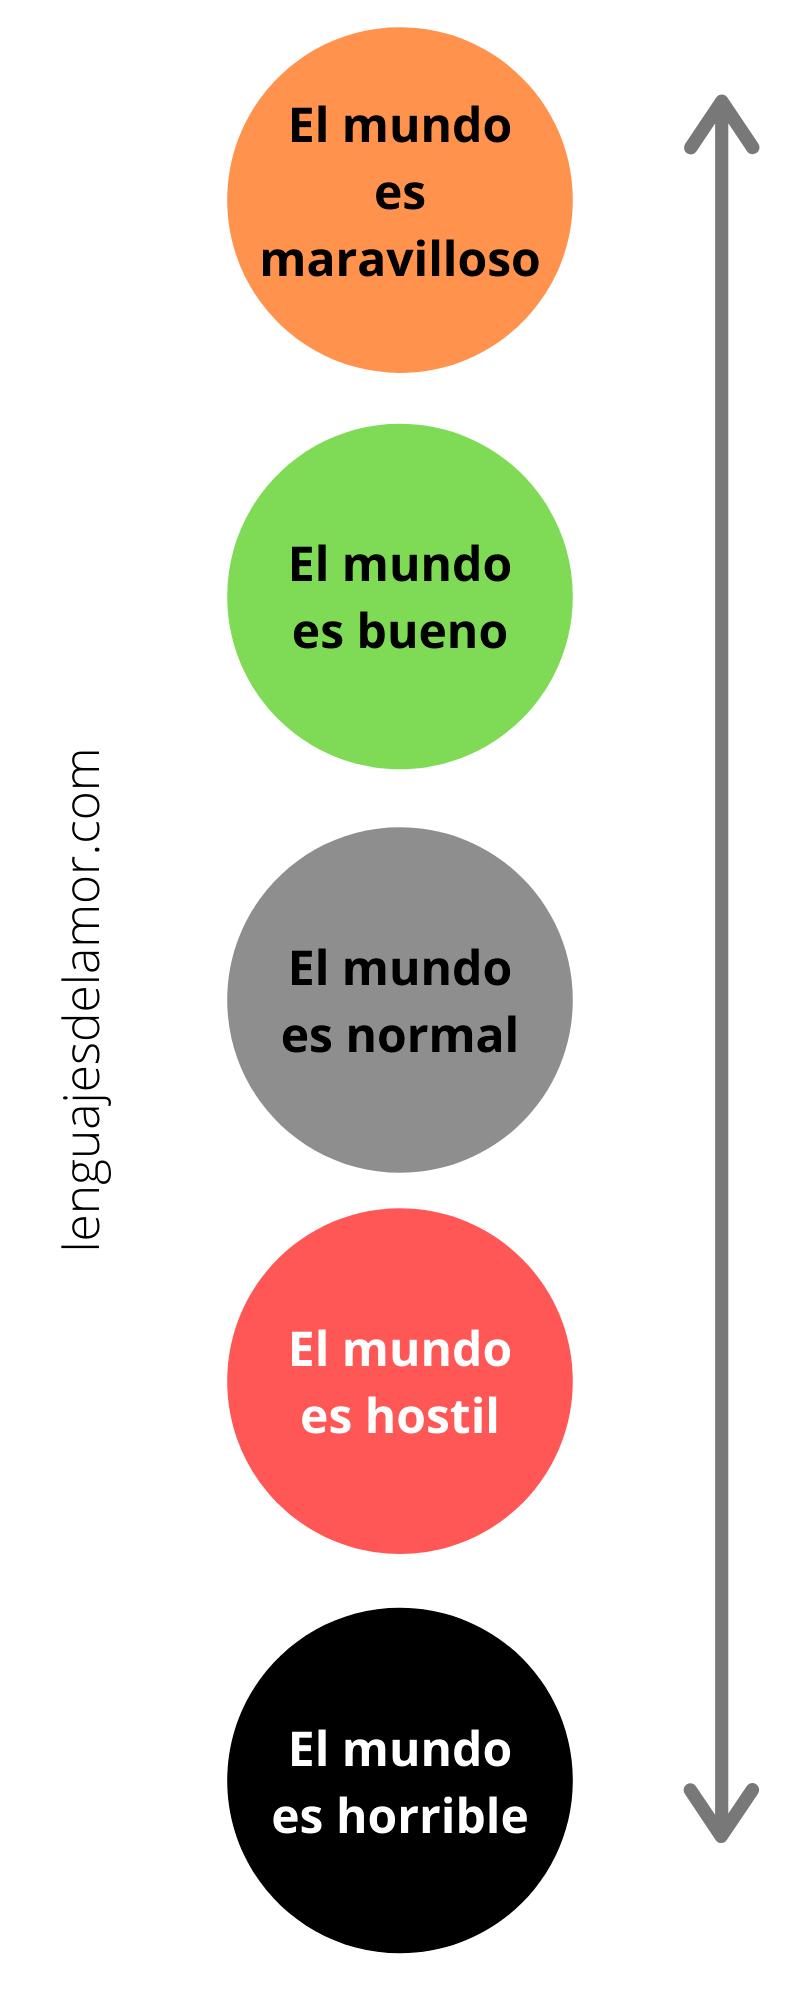 Semáforo de cosmovisión en lenguajesdelamor.com